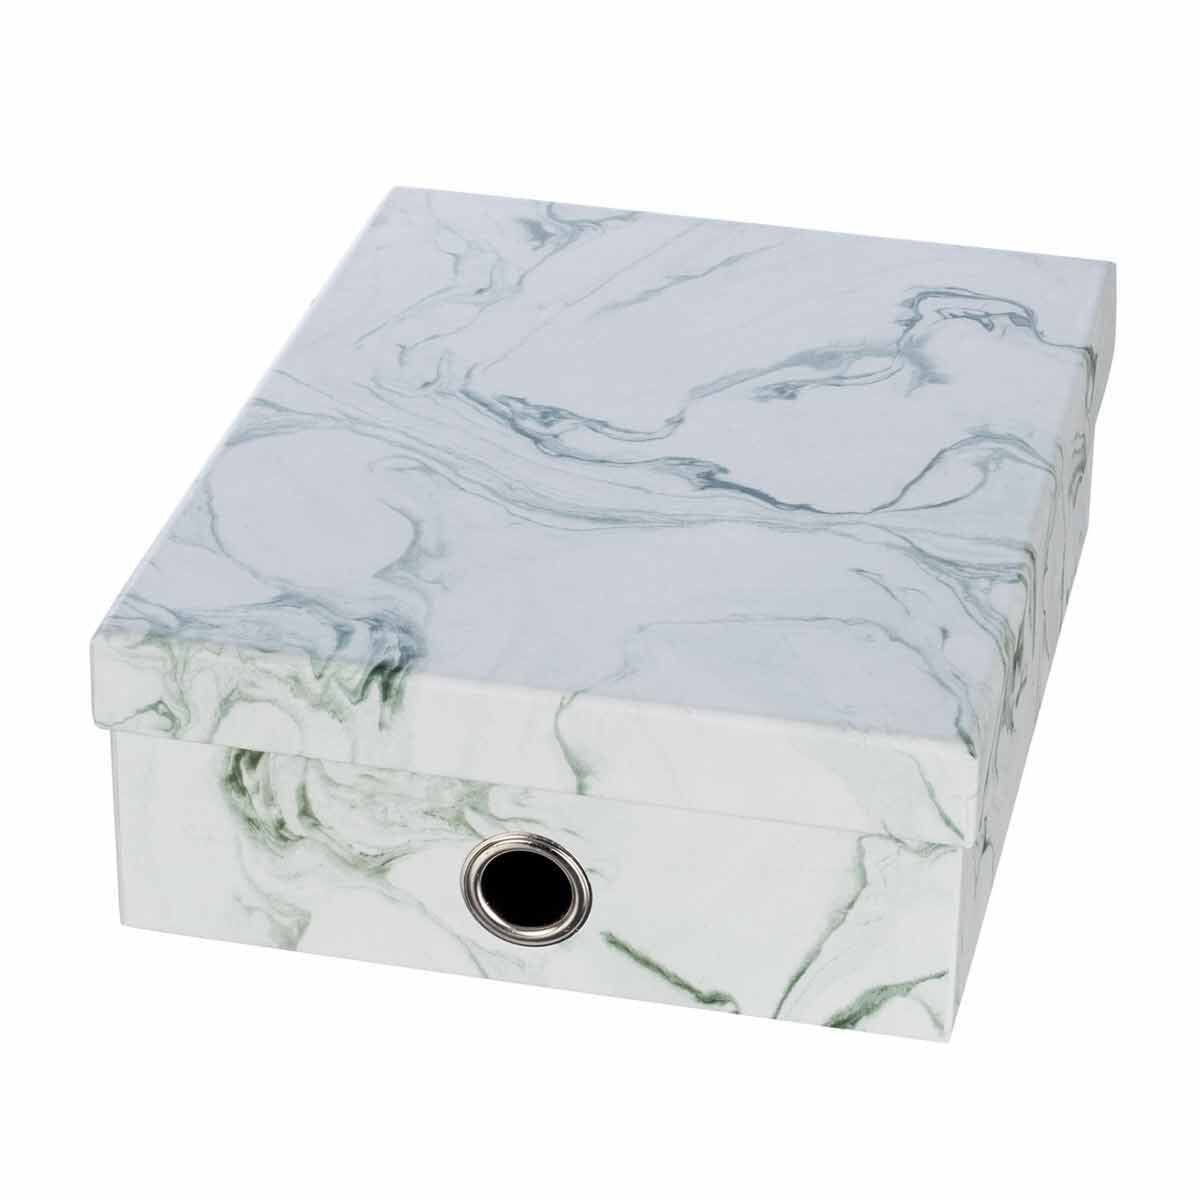 Ryman Storage Box Large Marble Grey